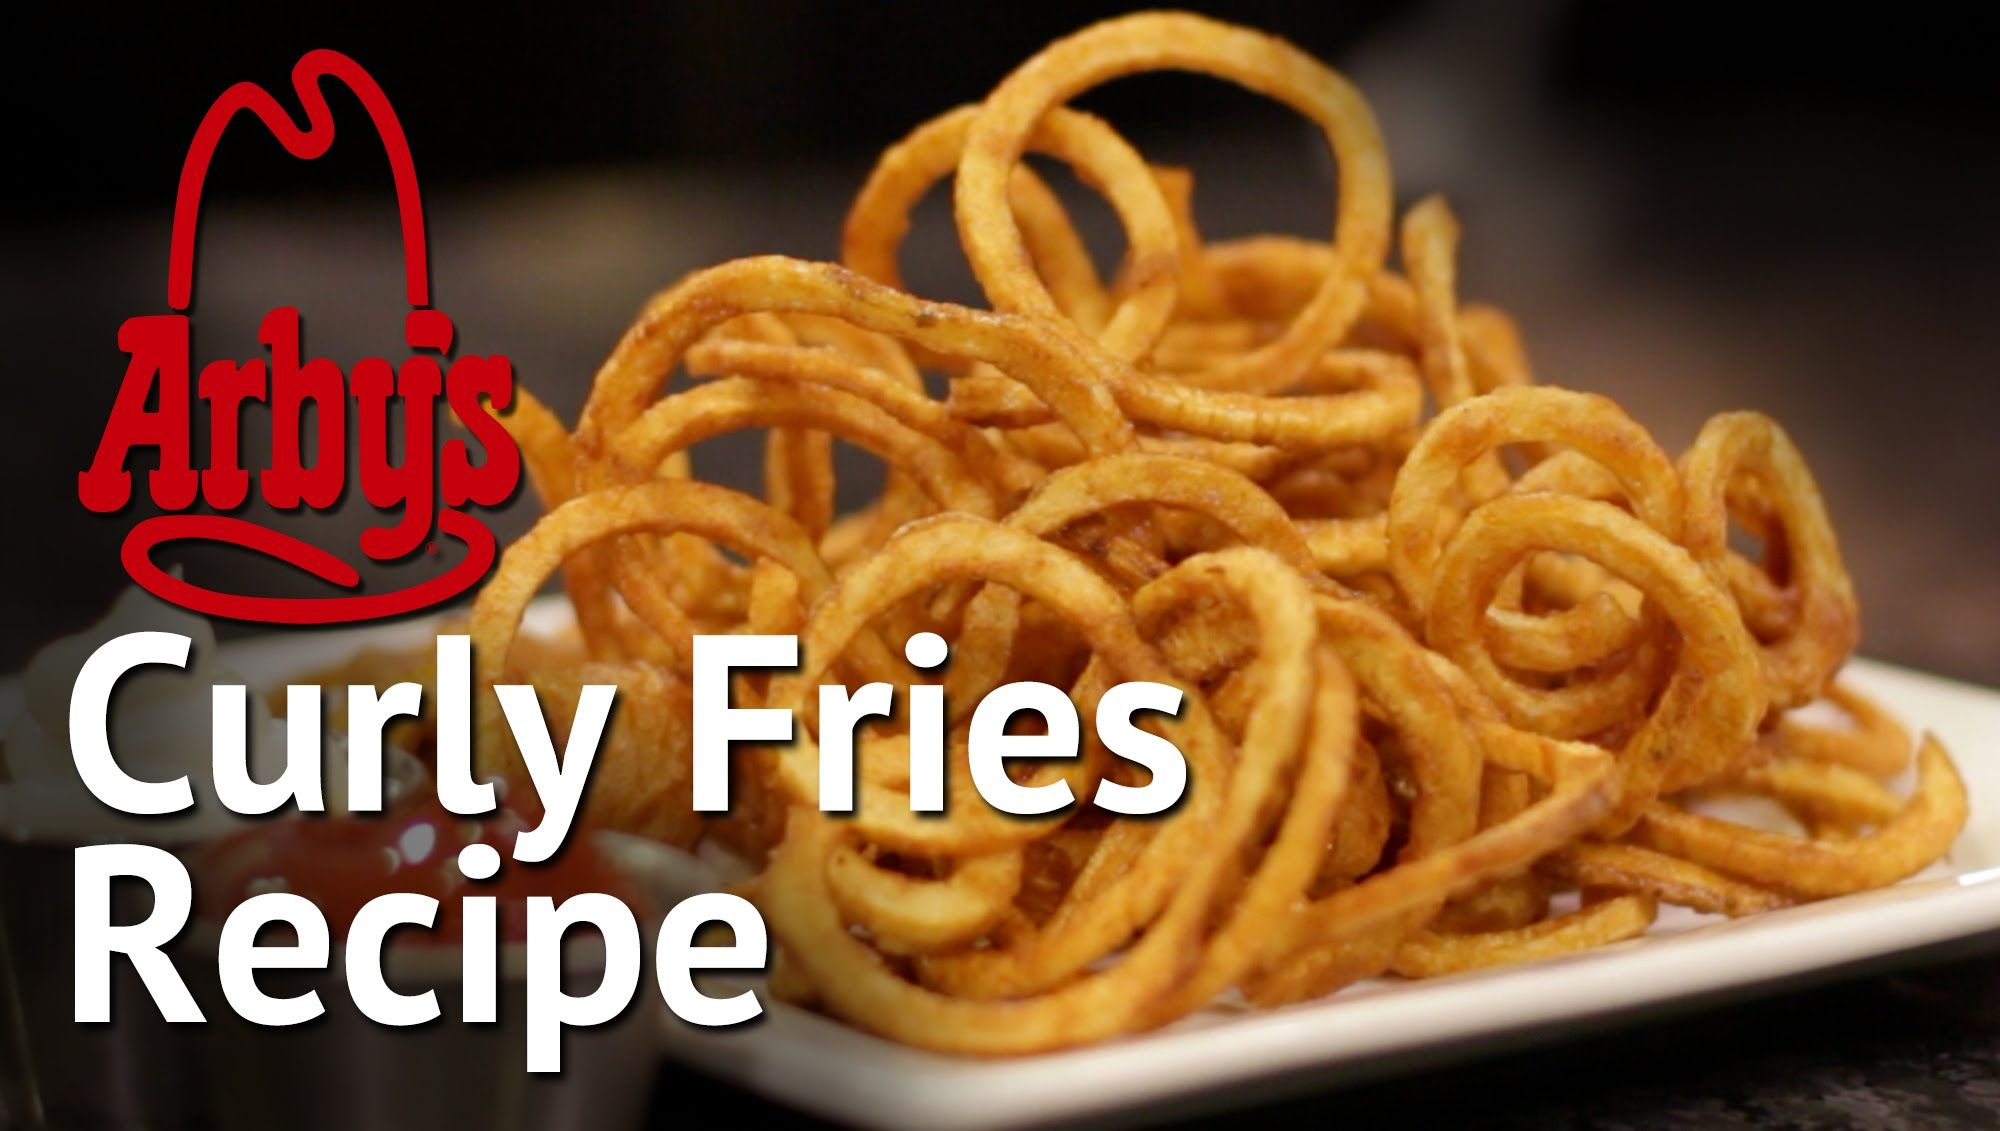 Air Fryer Frozen Curly Fries Recipe Air fryer recipes